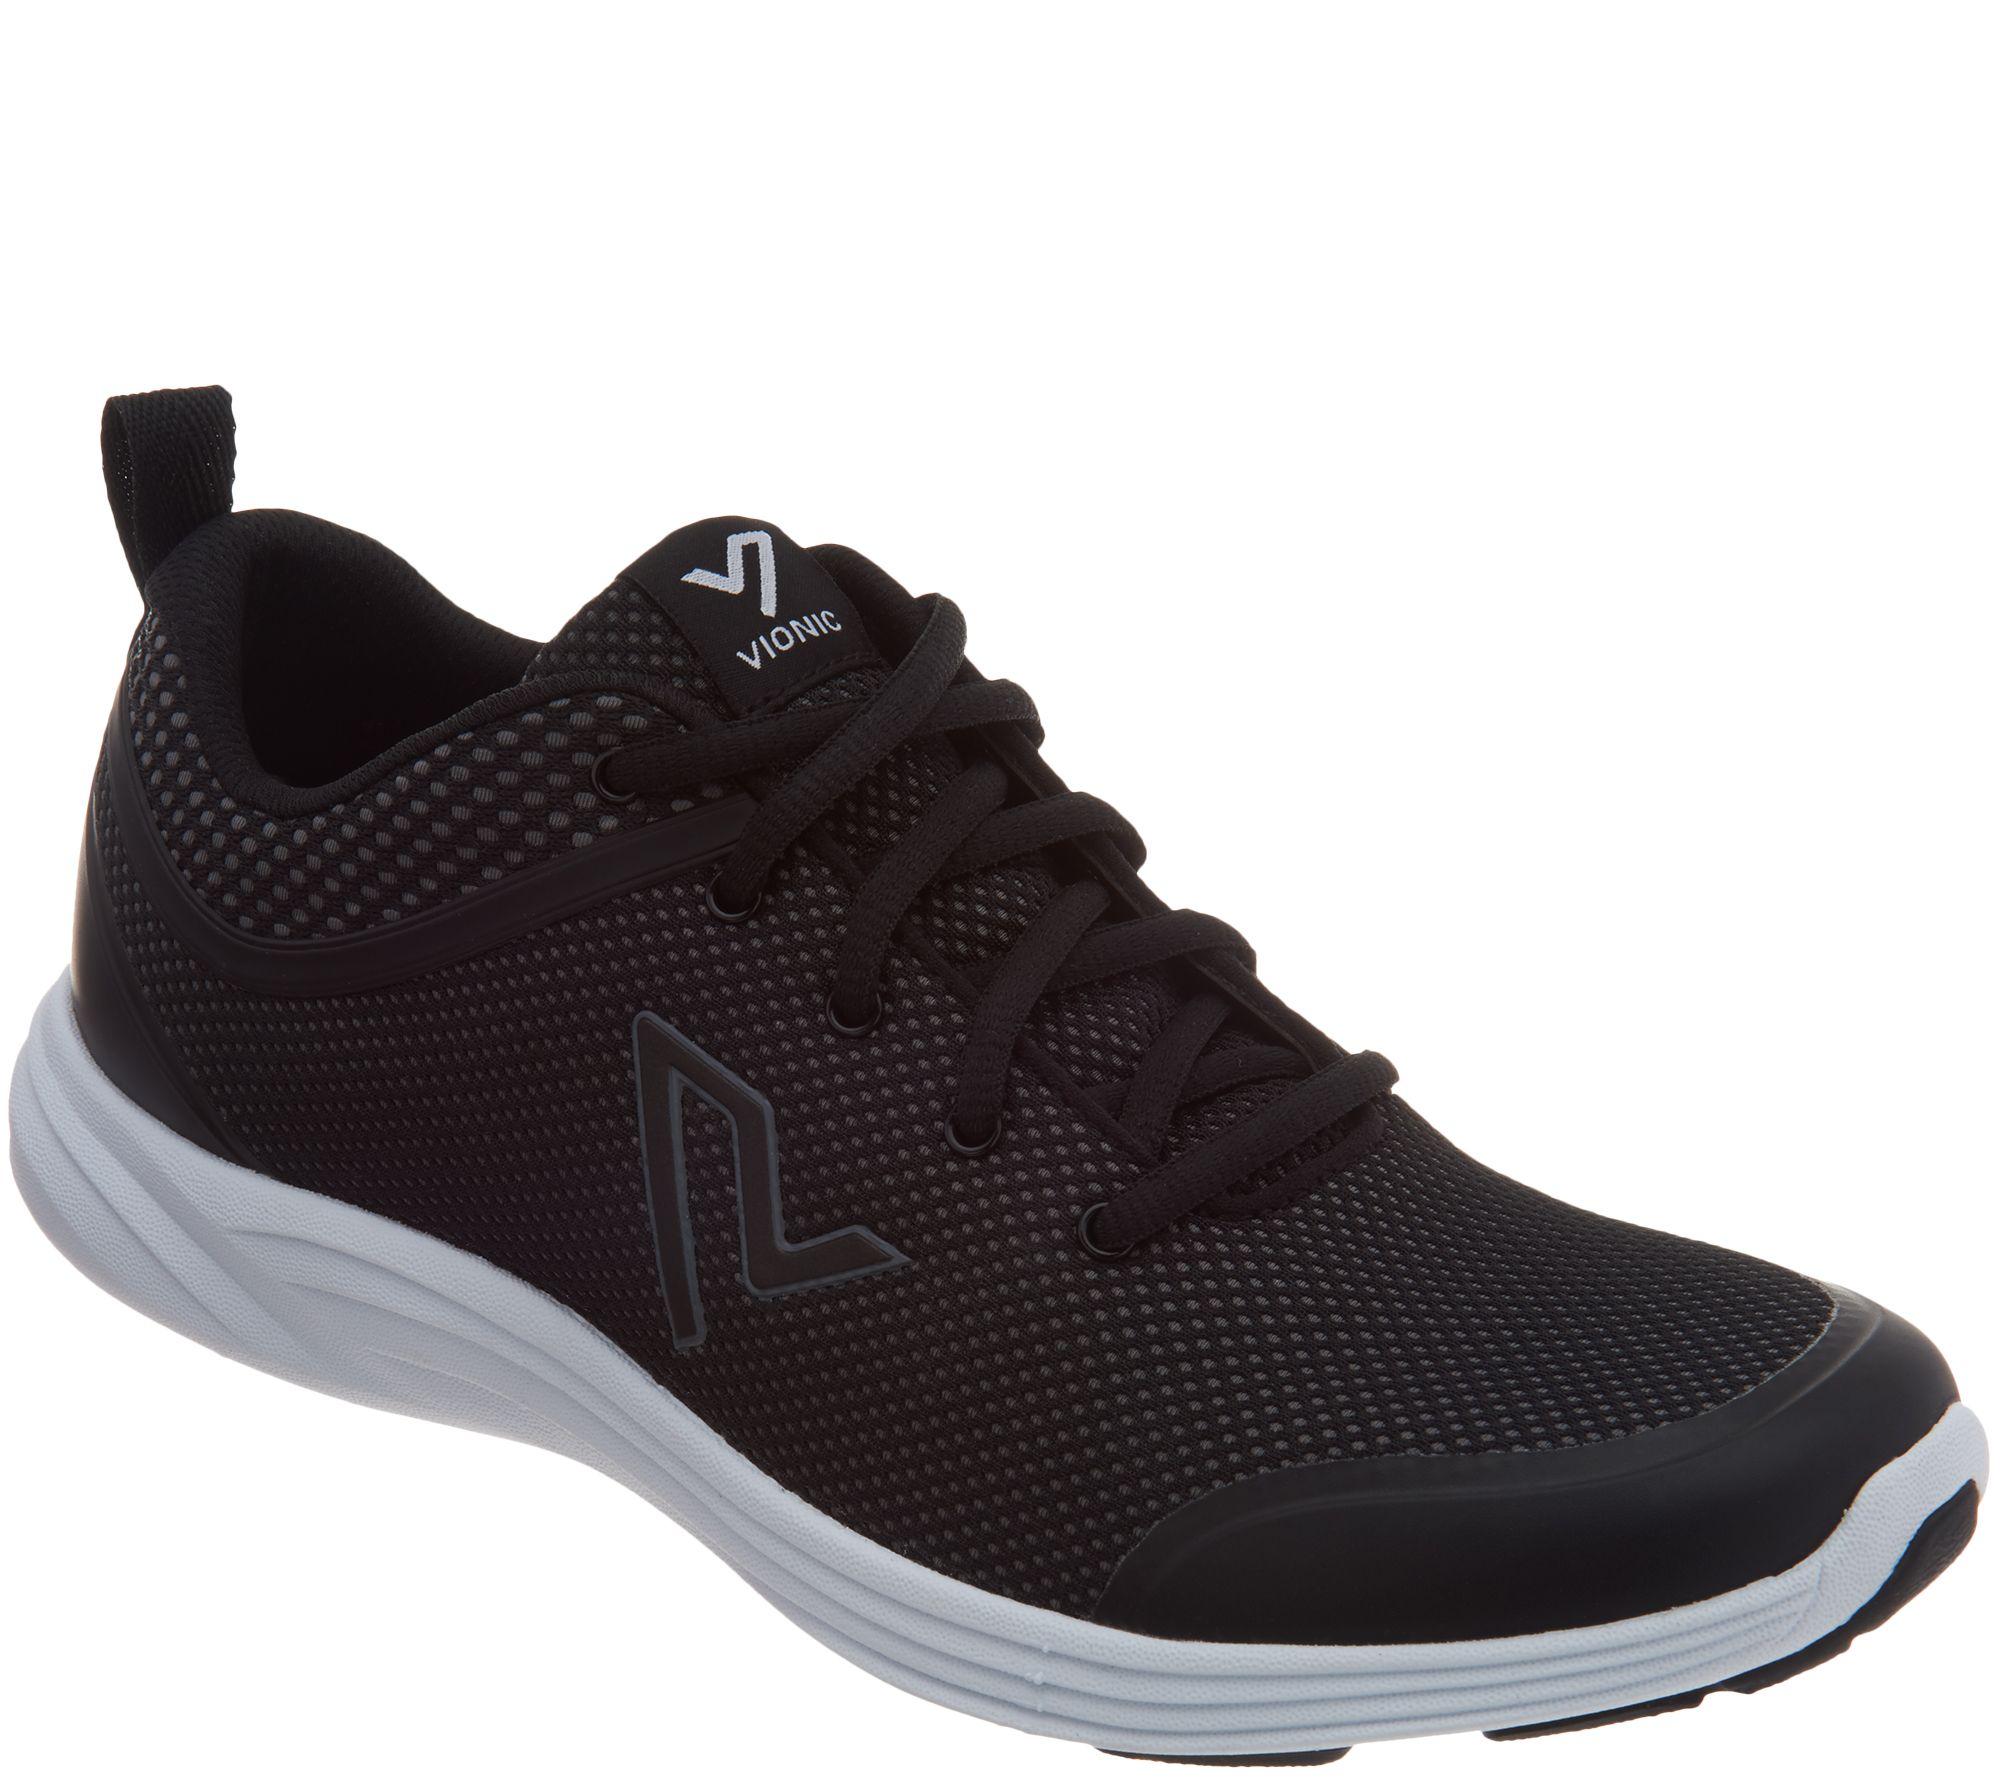 87297f75fdad Vionic Mesh Lace-Up Sneakers - Jasmine - Page 1 — QVC.com